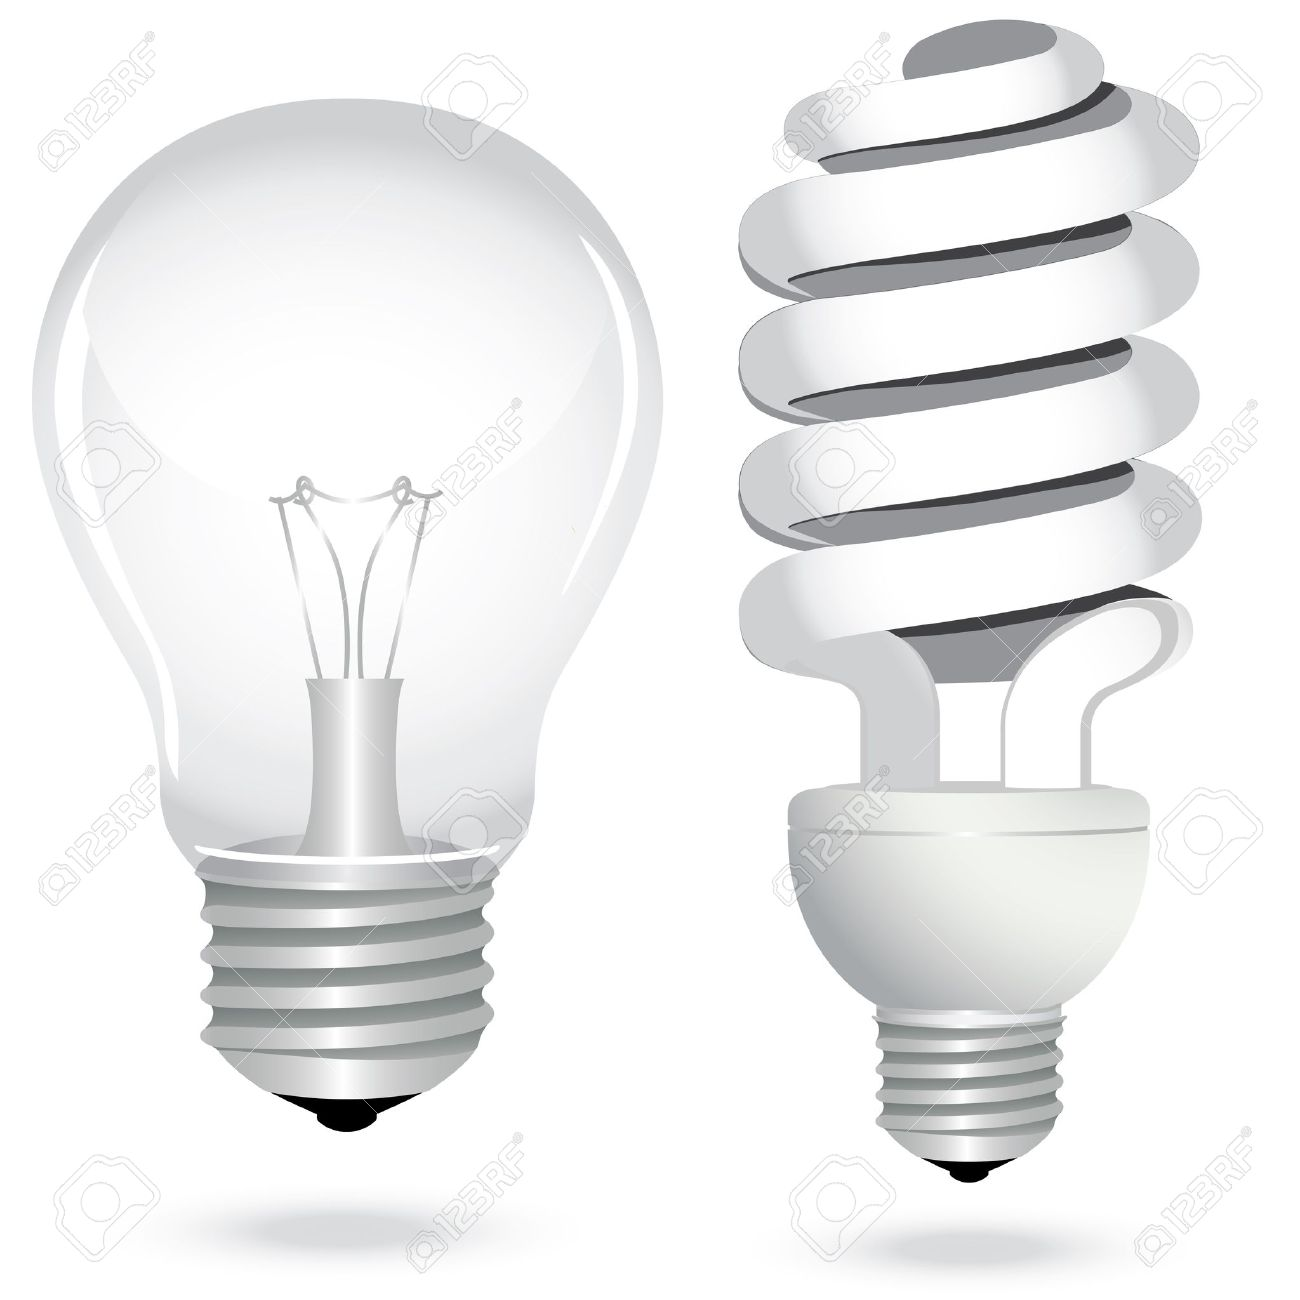 Icon set energy saving light bulb lamp glass electricity. Vector illustration. - 11816173